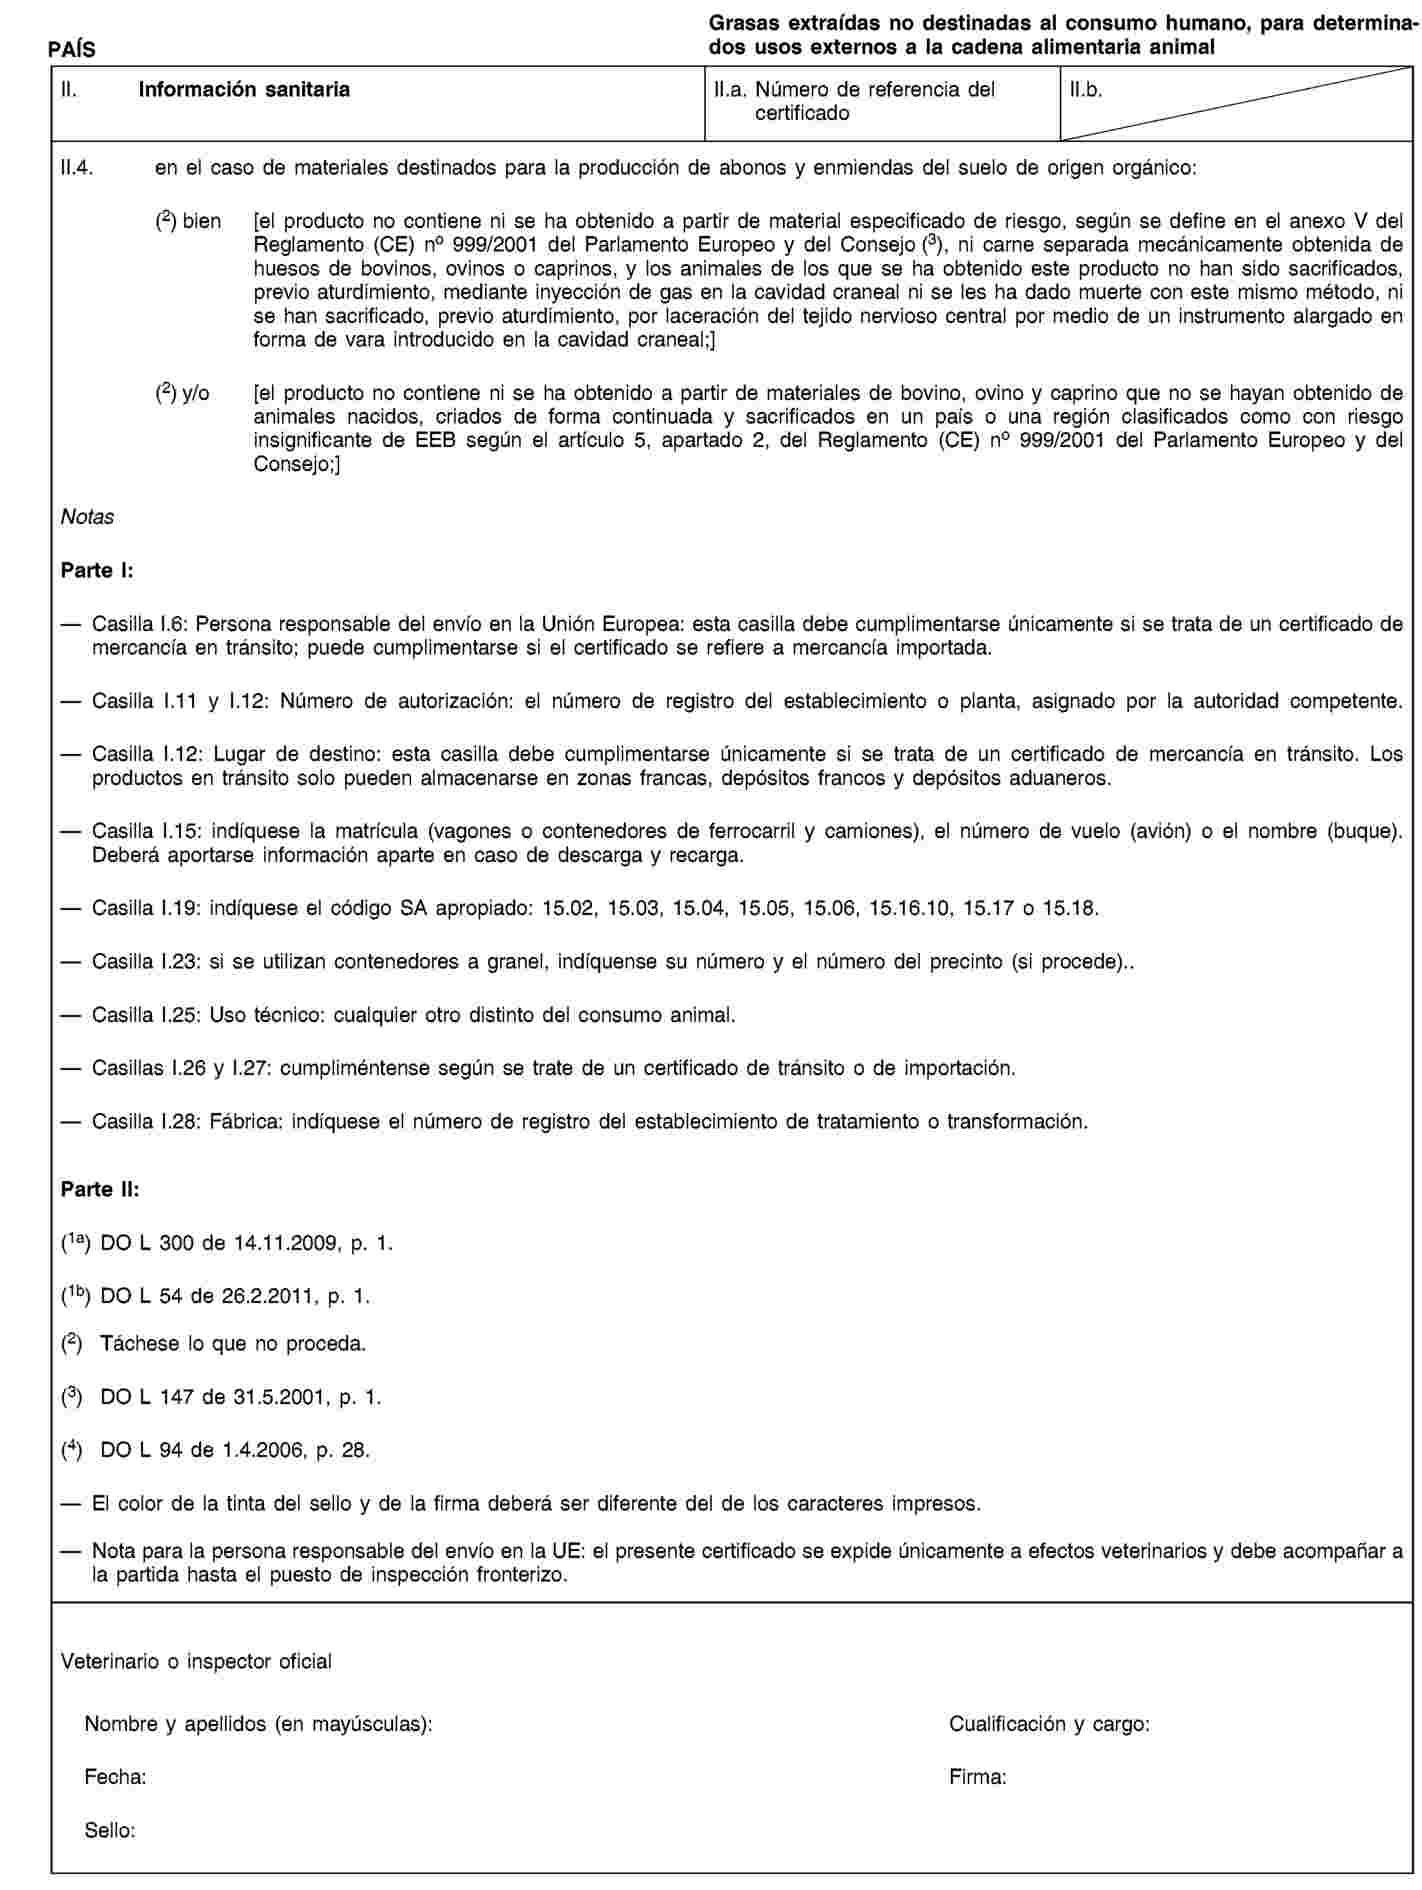 Imagen: https://eur-lex.europa.eu/resource.html?uri=uriserv:OJ.L_.2011.054.01.0001.01.SPA.xhtml.L_2011054ES.01021301.tif.jpg